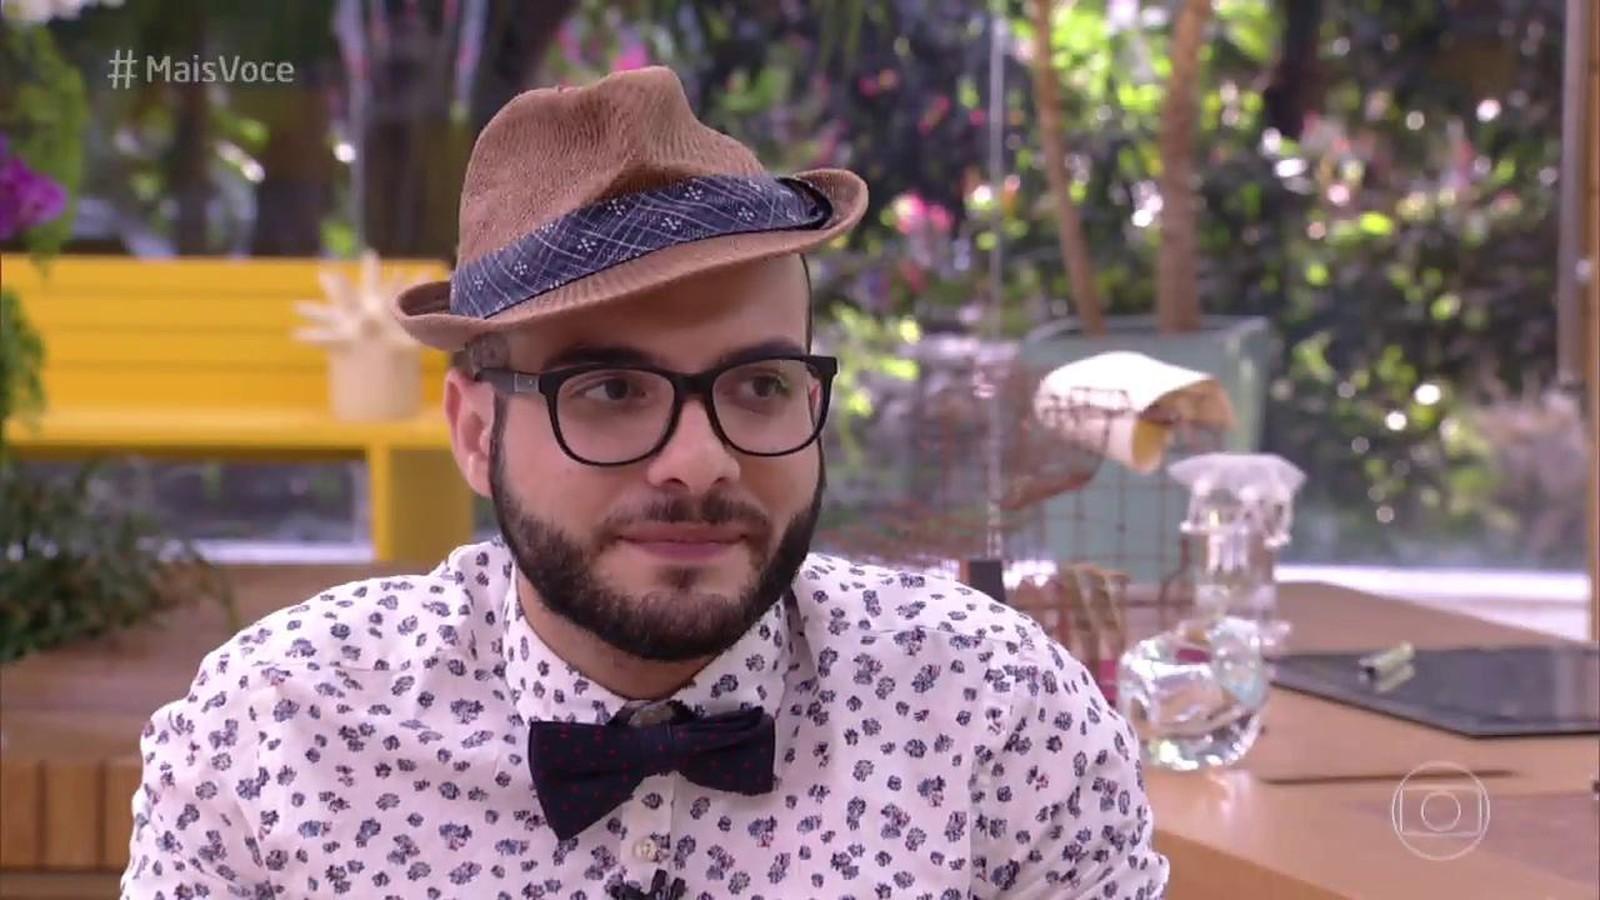 Mahmoud admite mentira para entrar no BBB